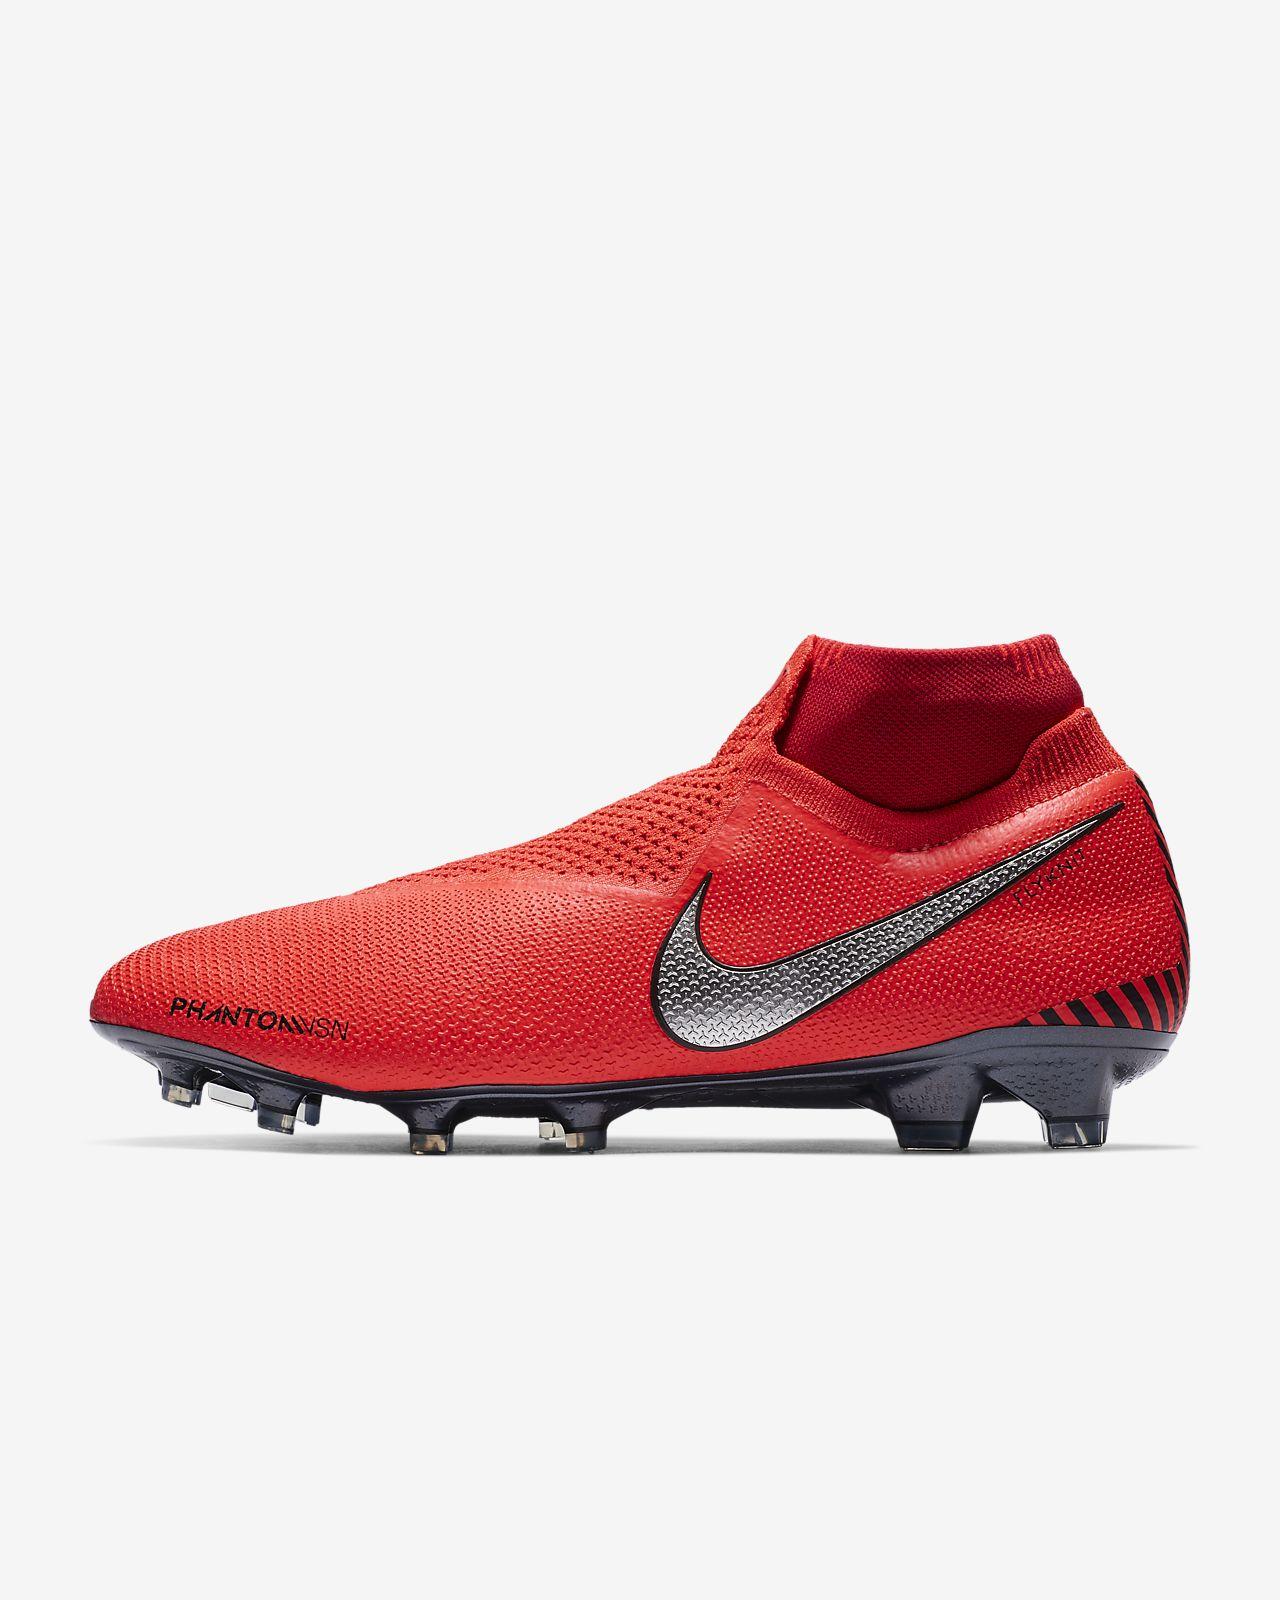 Elite Terreni Da Dynamic Per Calcio Nike Scarpa Fit Duri Phantomvsn 01qww